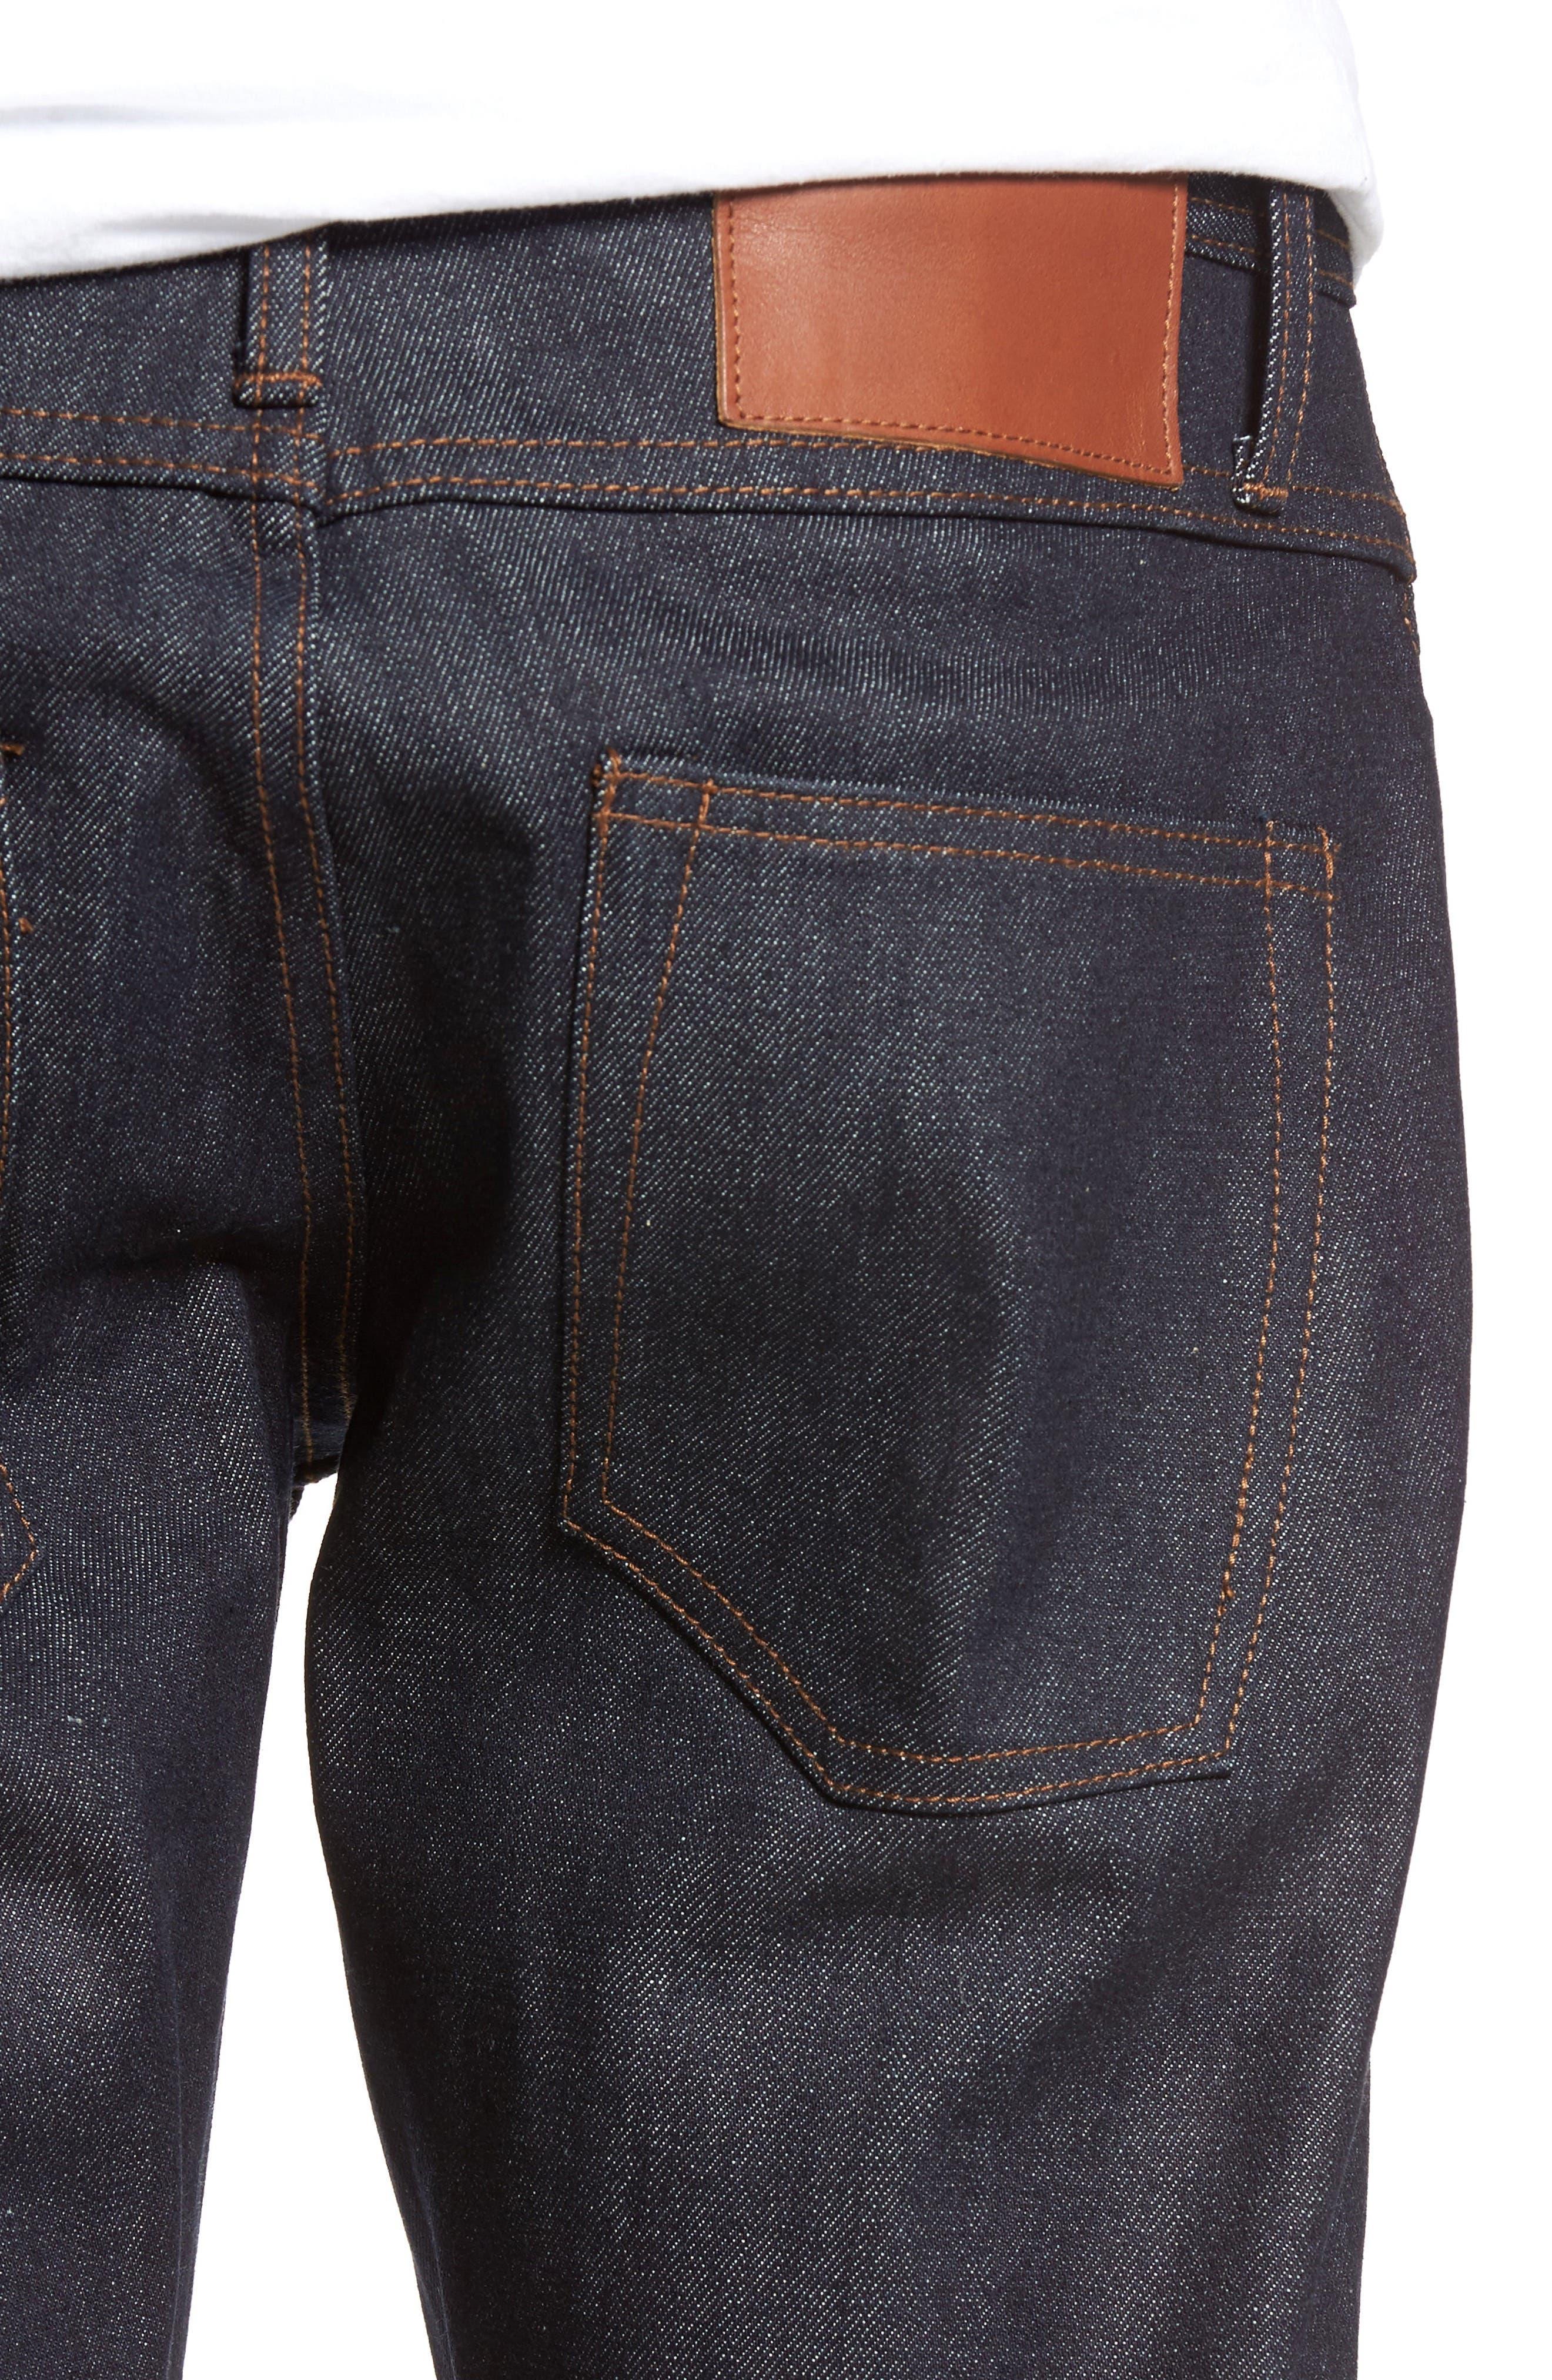 Alternate Image 4  - The Unbranded Brand UB301 Straight Leg Raw Selvedge Jeans (Indigo)